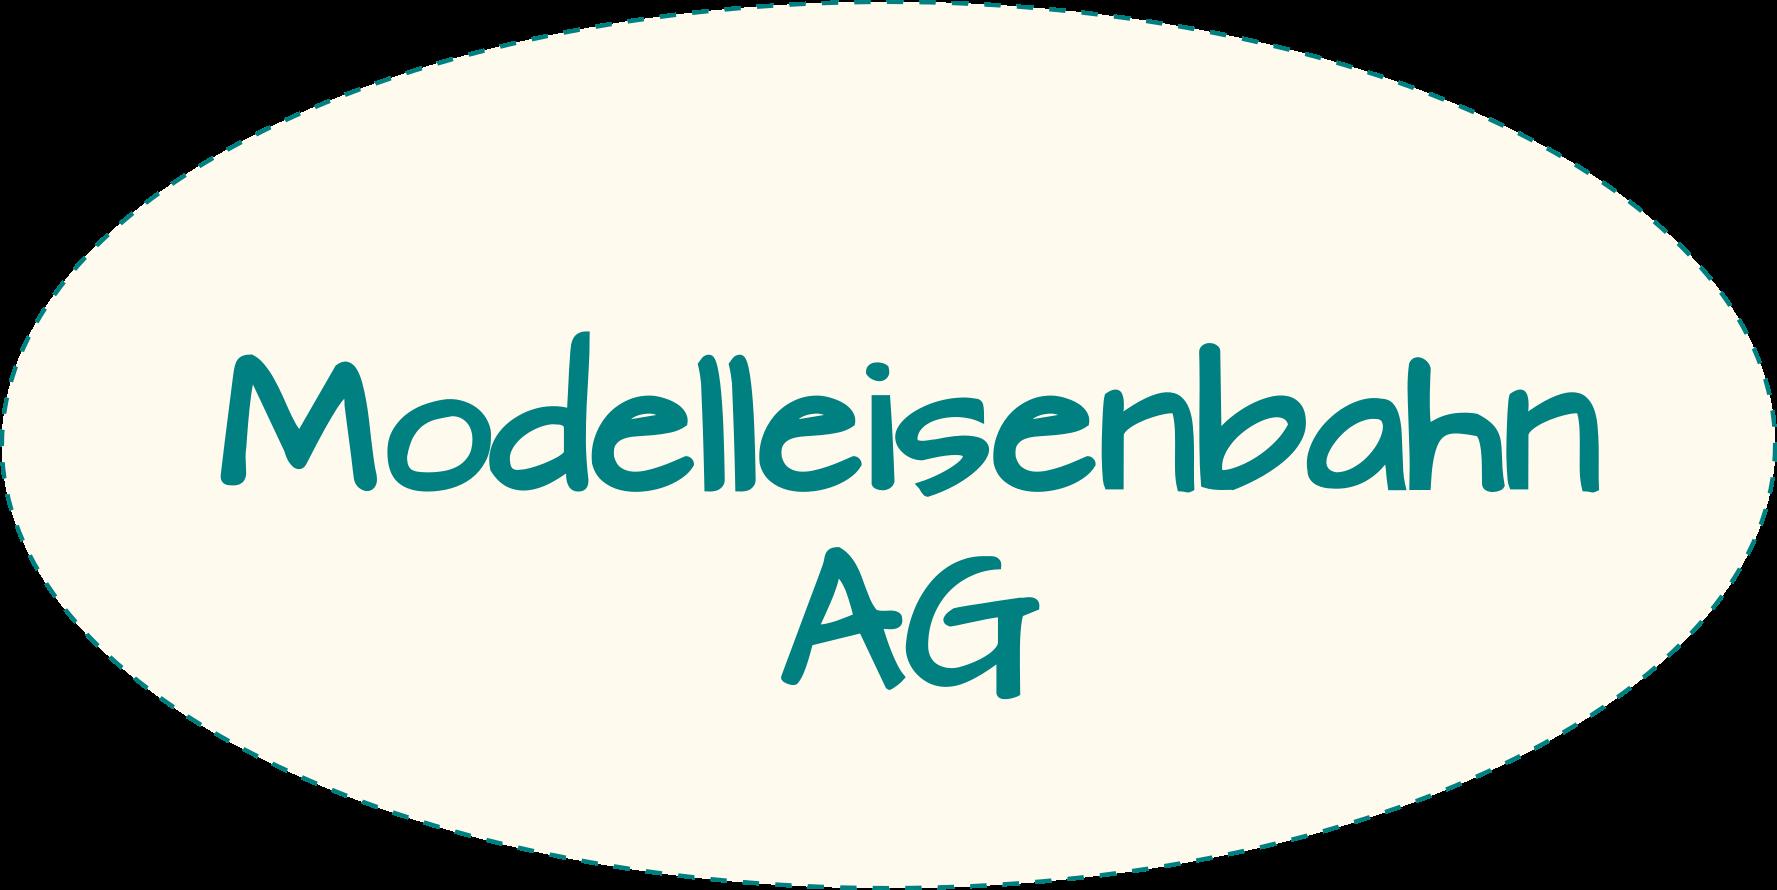 ModelleisenbahnAG